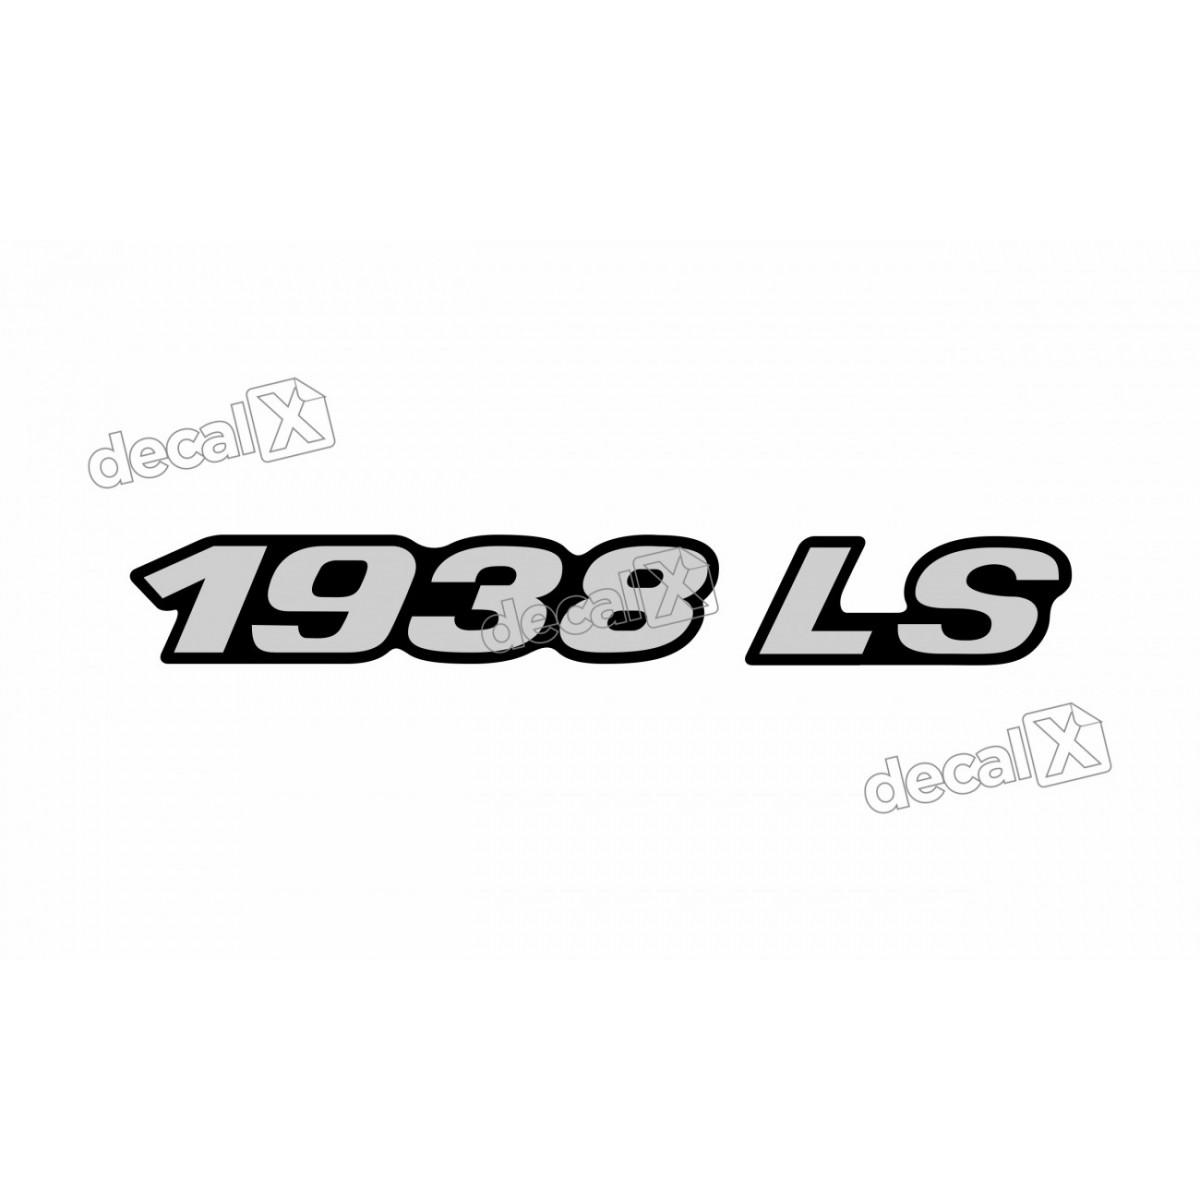 Adesivo Emblema Resinado Mercedes 1938 Ls Cm71 Decalx